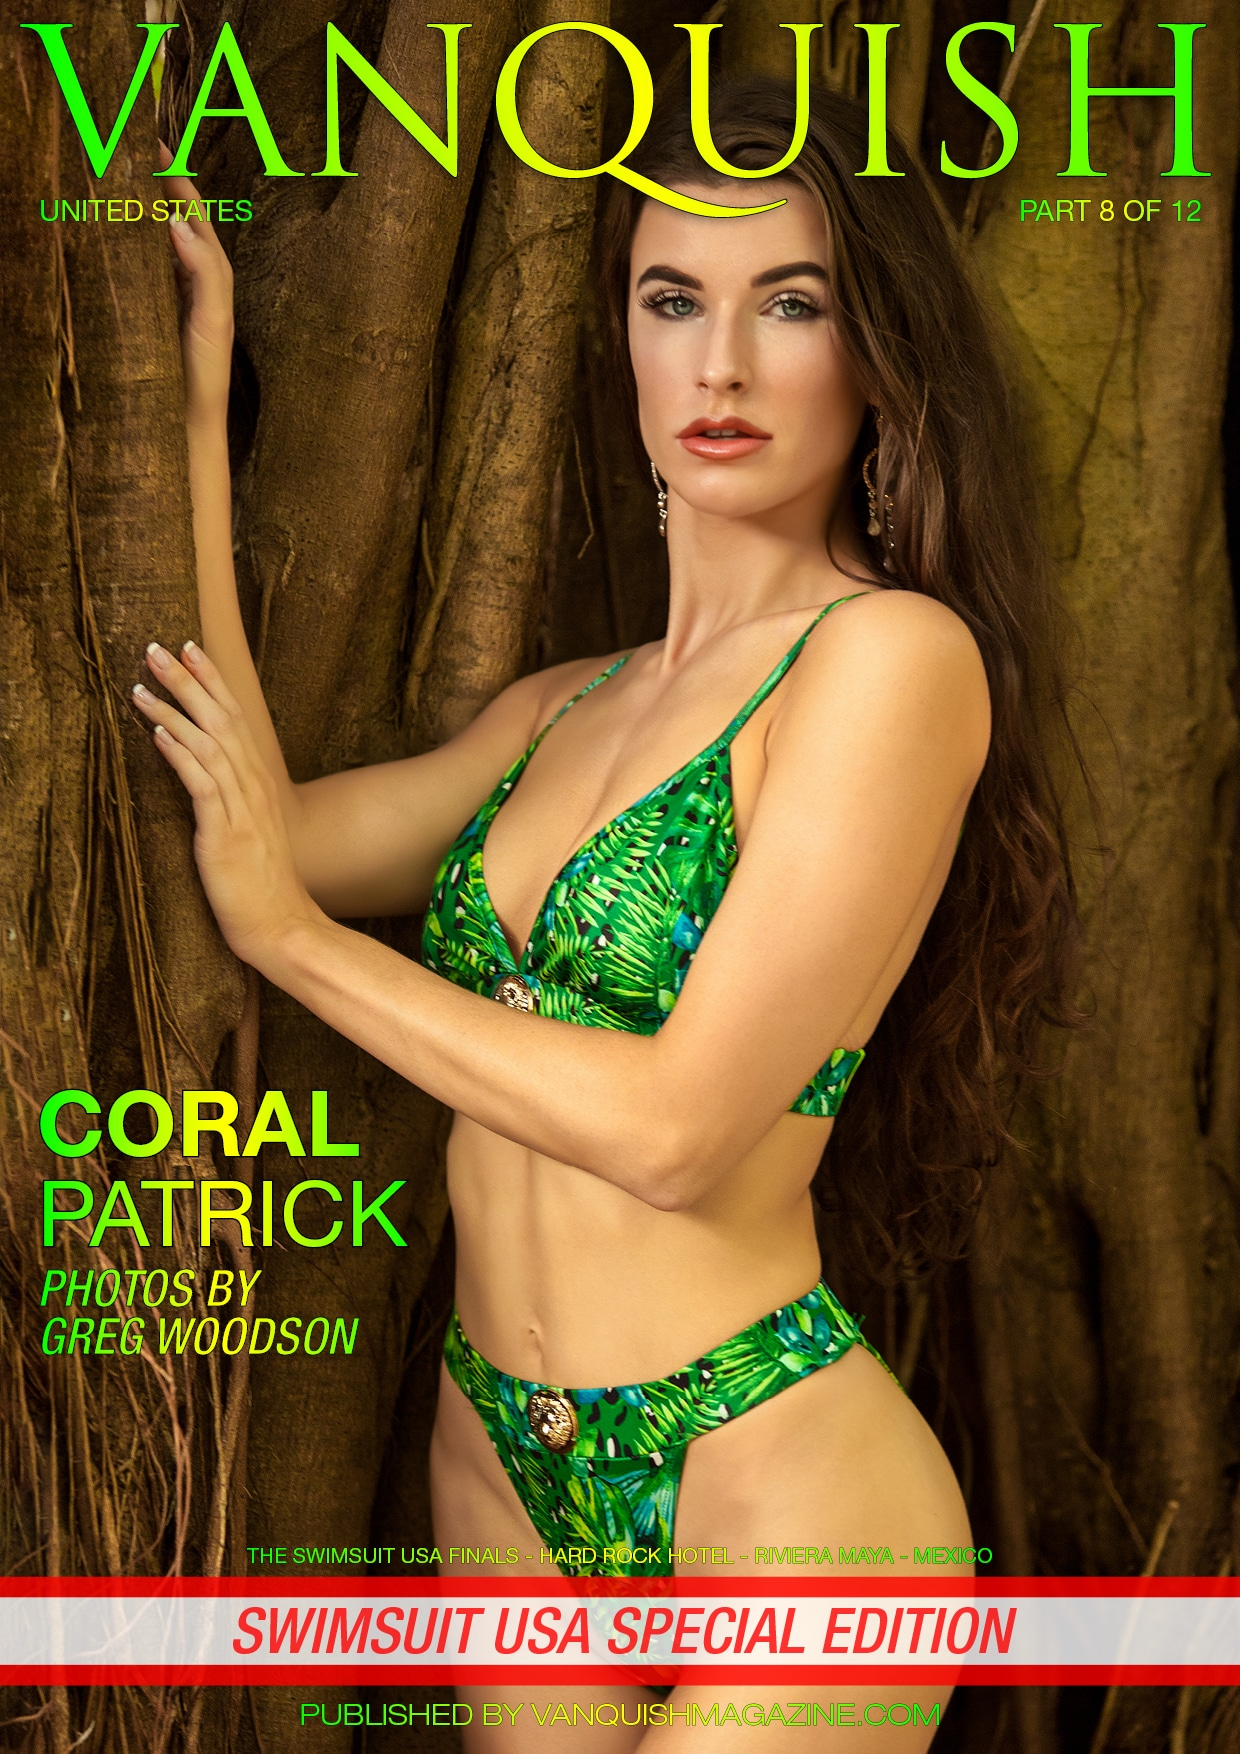 Vanquish Magazine – Swimsuit Usa 2018 – Part 8 – Coral Patrick